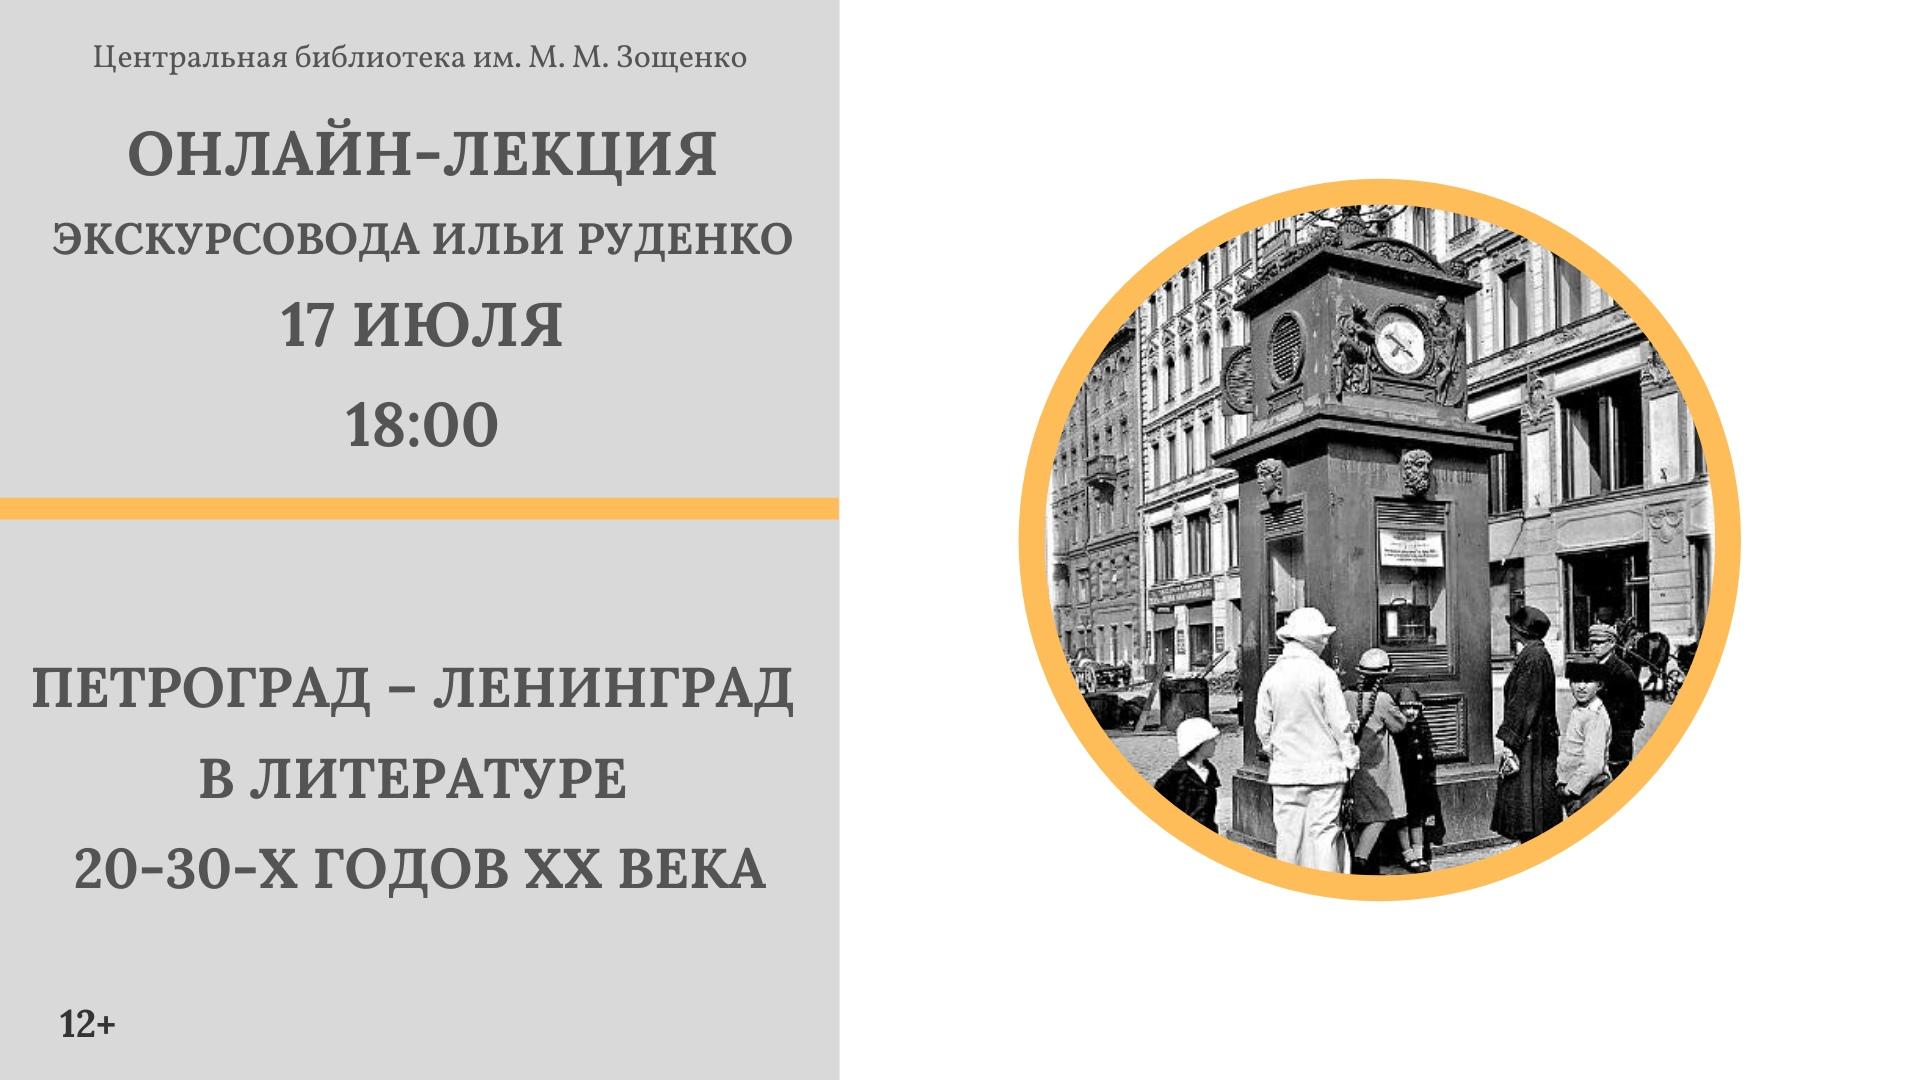 Онлайн-лекция «Петроград – Ленинград в литературе 20-30-х годов ХХ века»